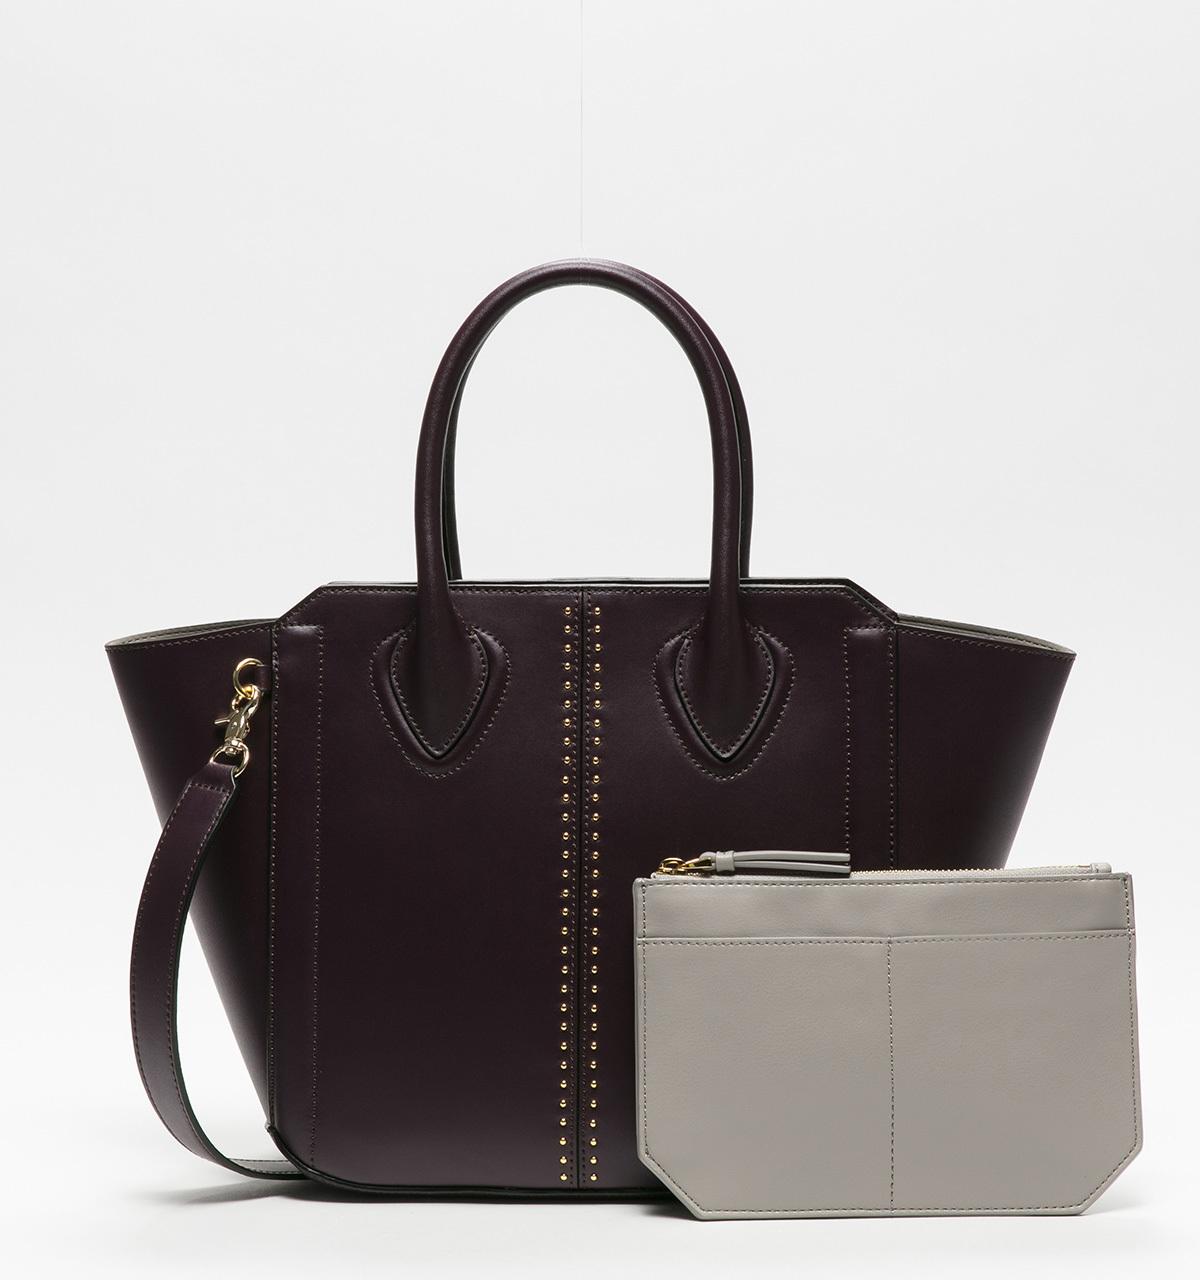 Ivanka Trump Tribeca Satchel - Pin Stud (Plum) Handbags 8NHPWH